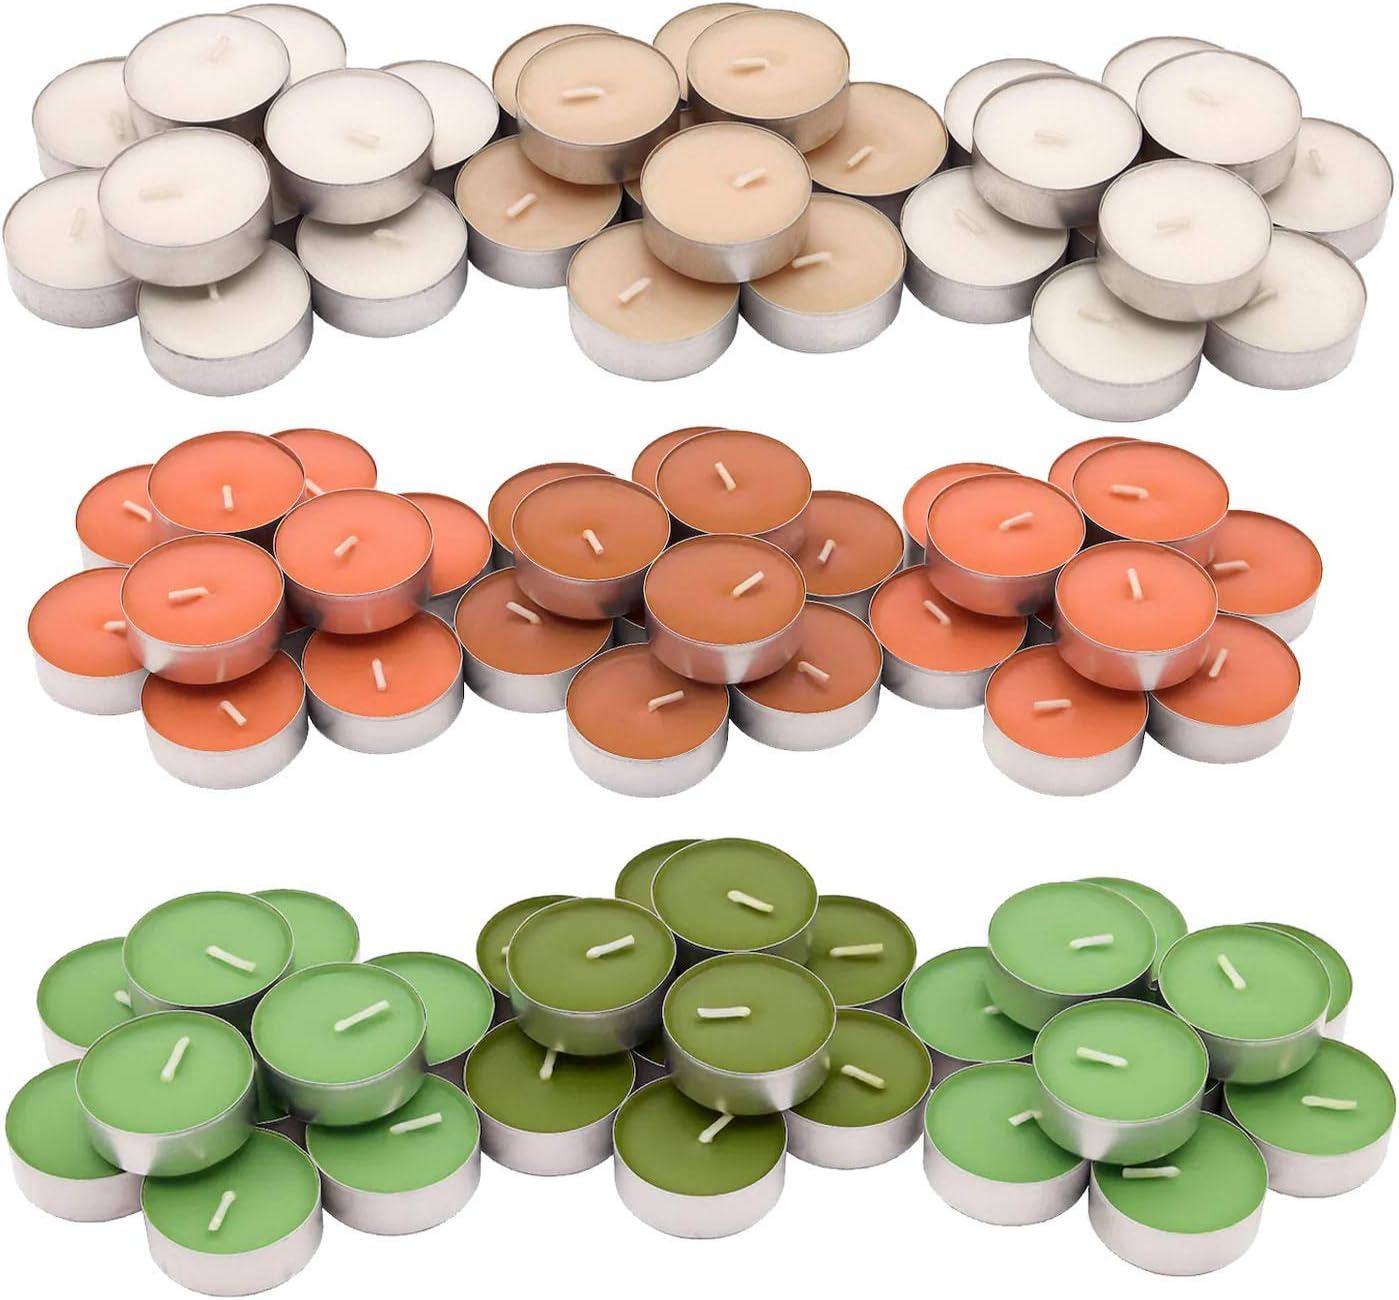 90 Tealights Total /… Vanilla Pleasure 30 Tealights of Each Scent 3-Pack Mixed IKEA Sinnlig Tealights Bundle: Green Apple Pear Orange//Peach Scents